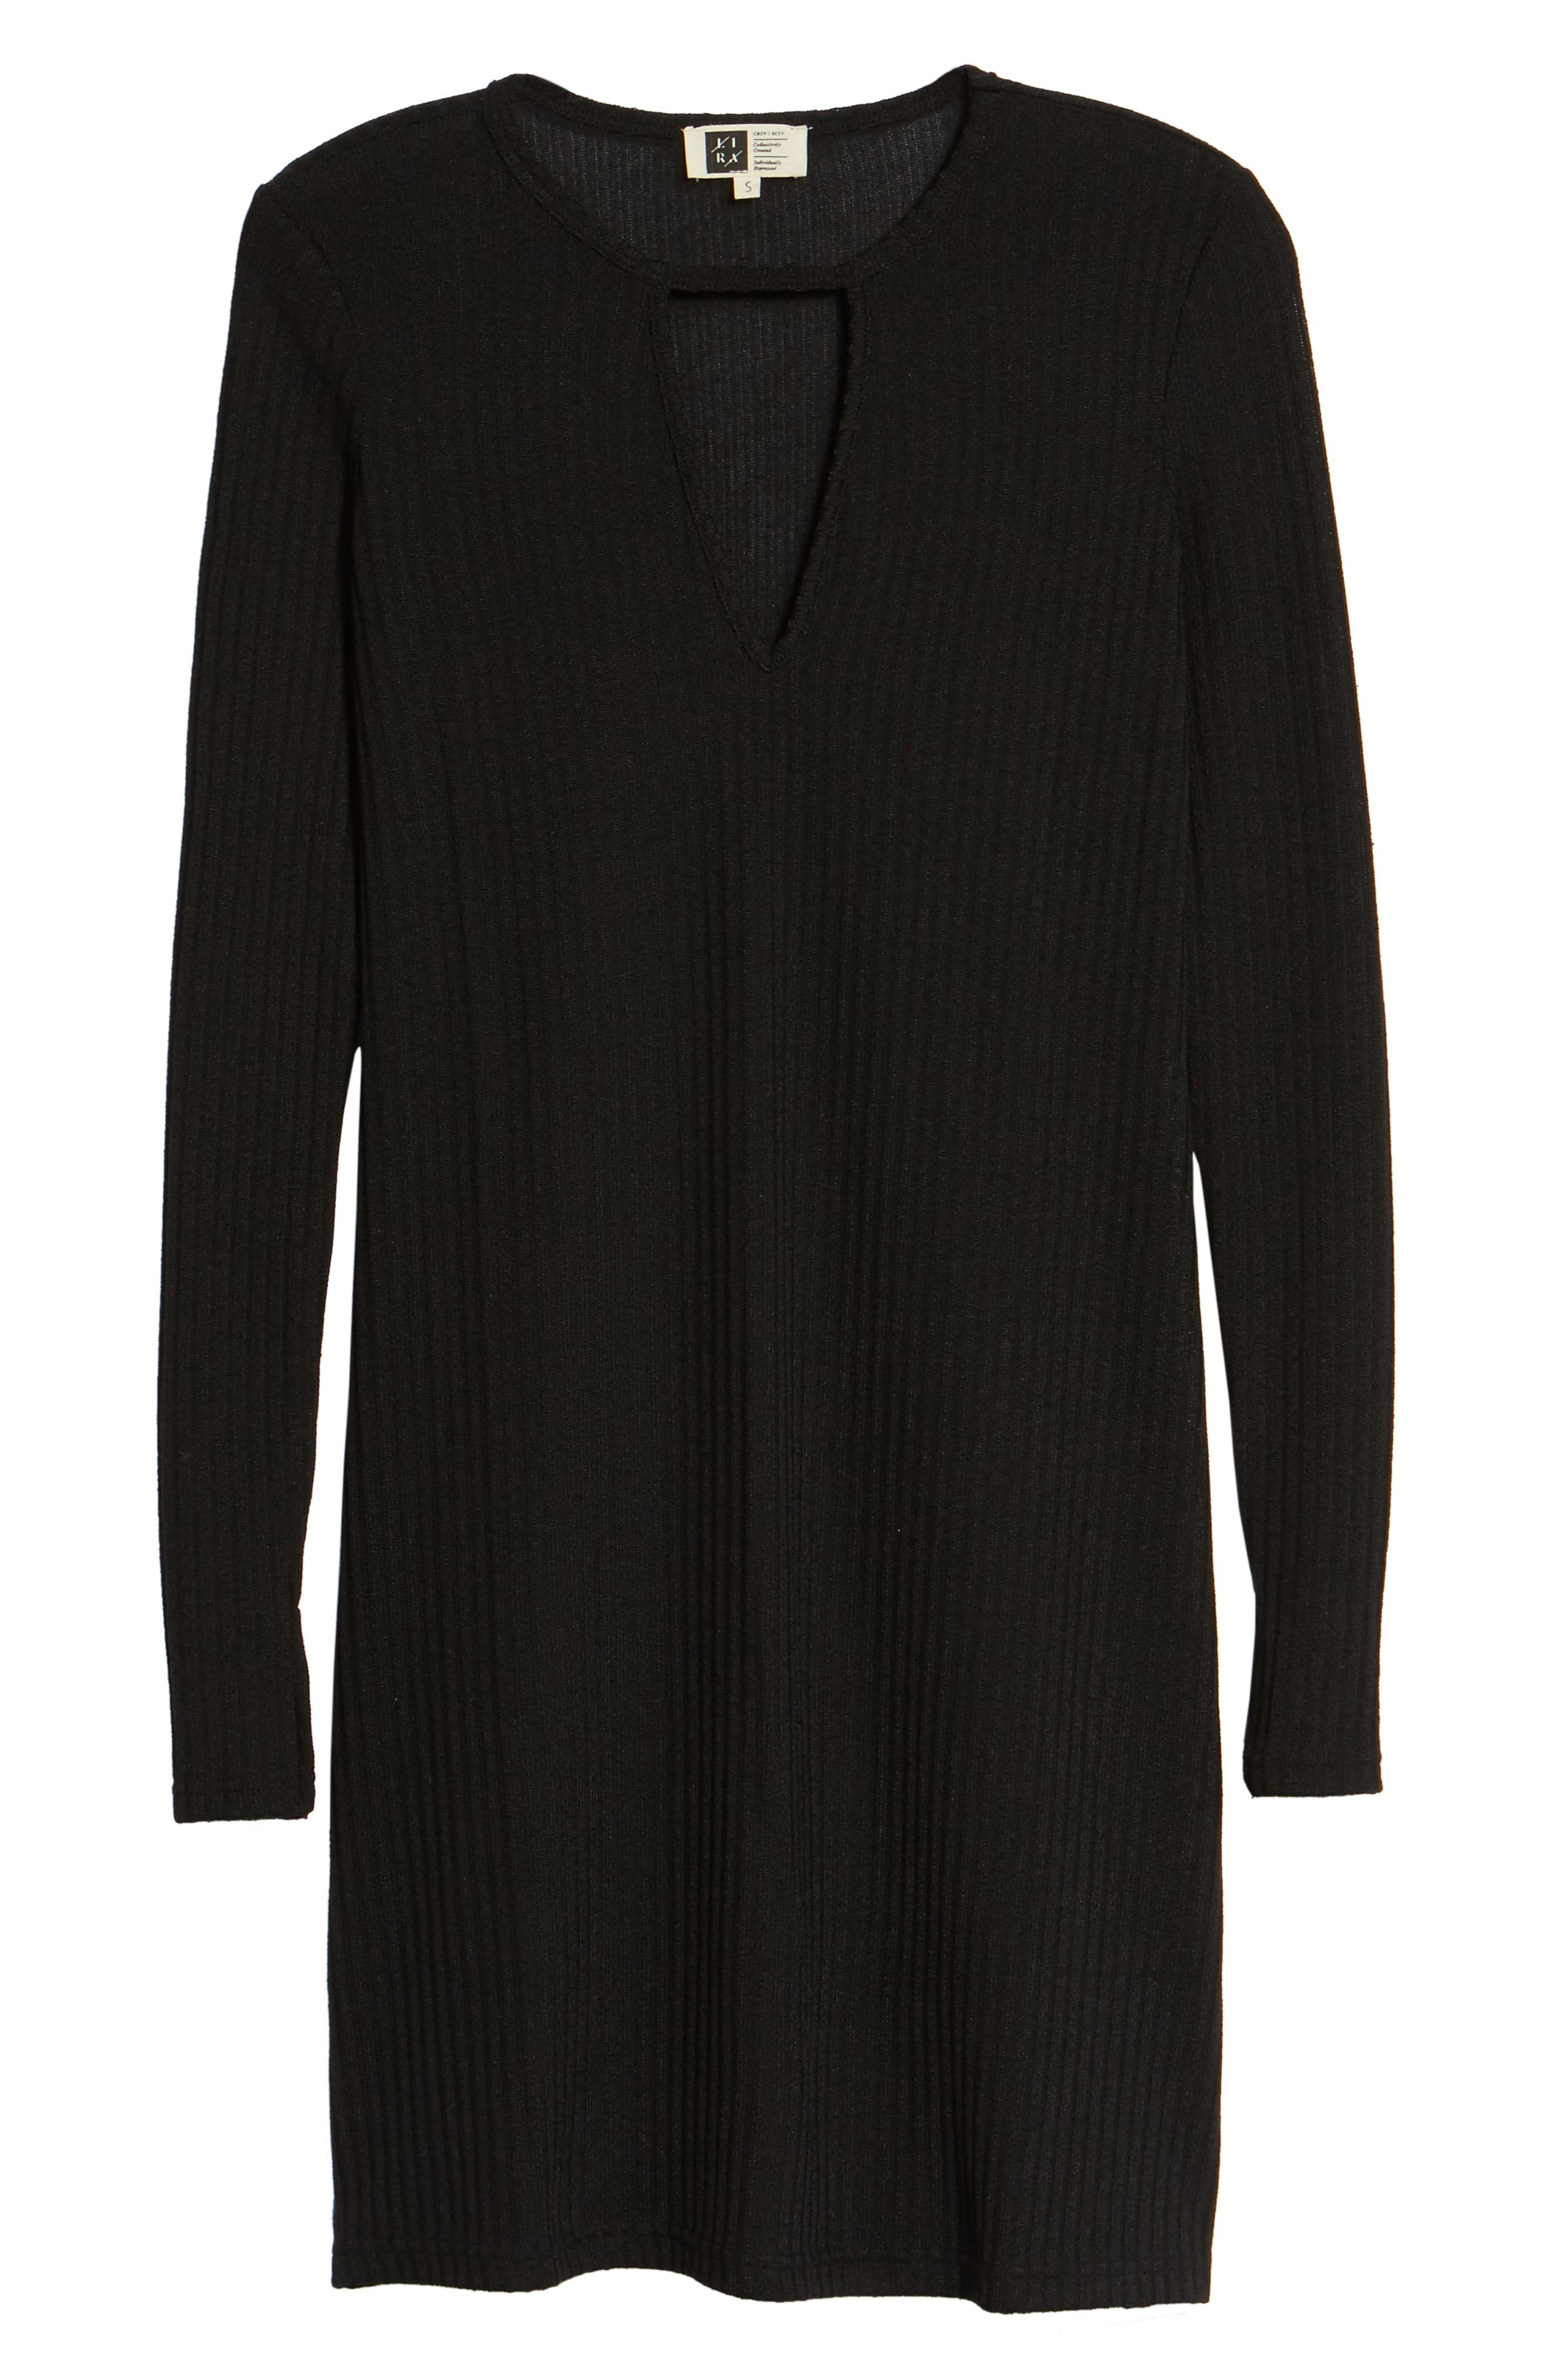 Maven Thermal Dress,                             Alternate thumbnail 6, color,                             001